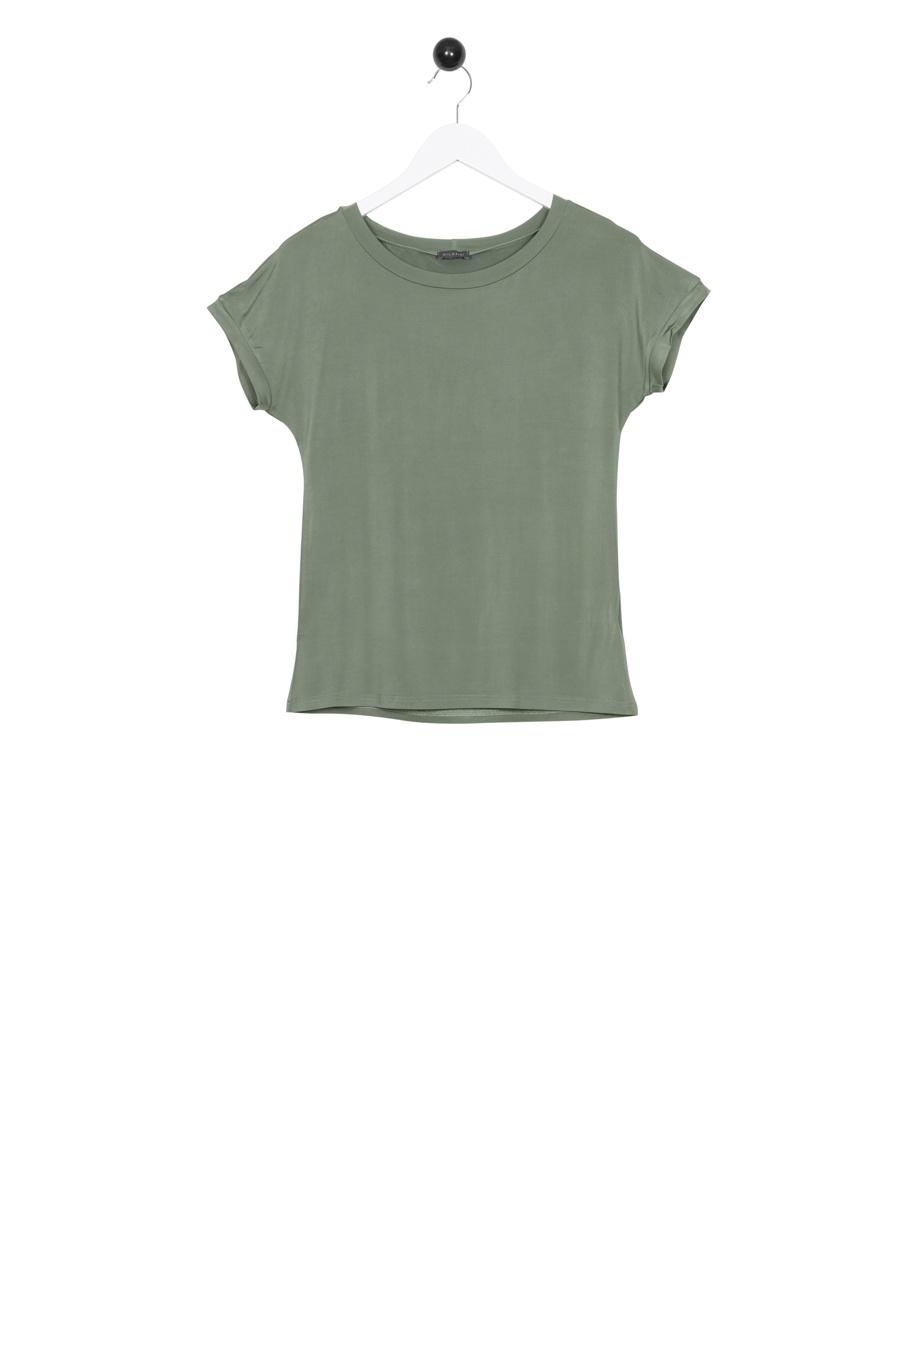 U-w T-shirt